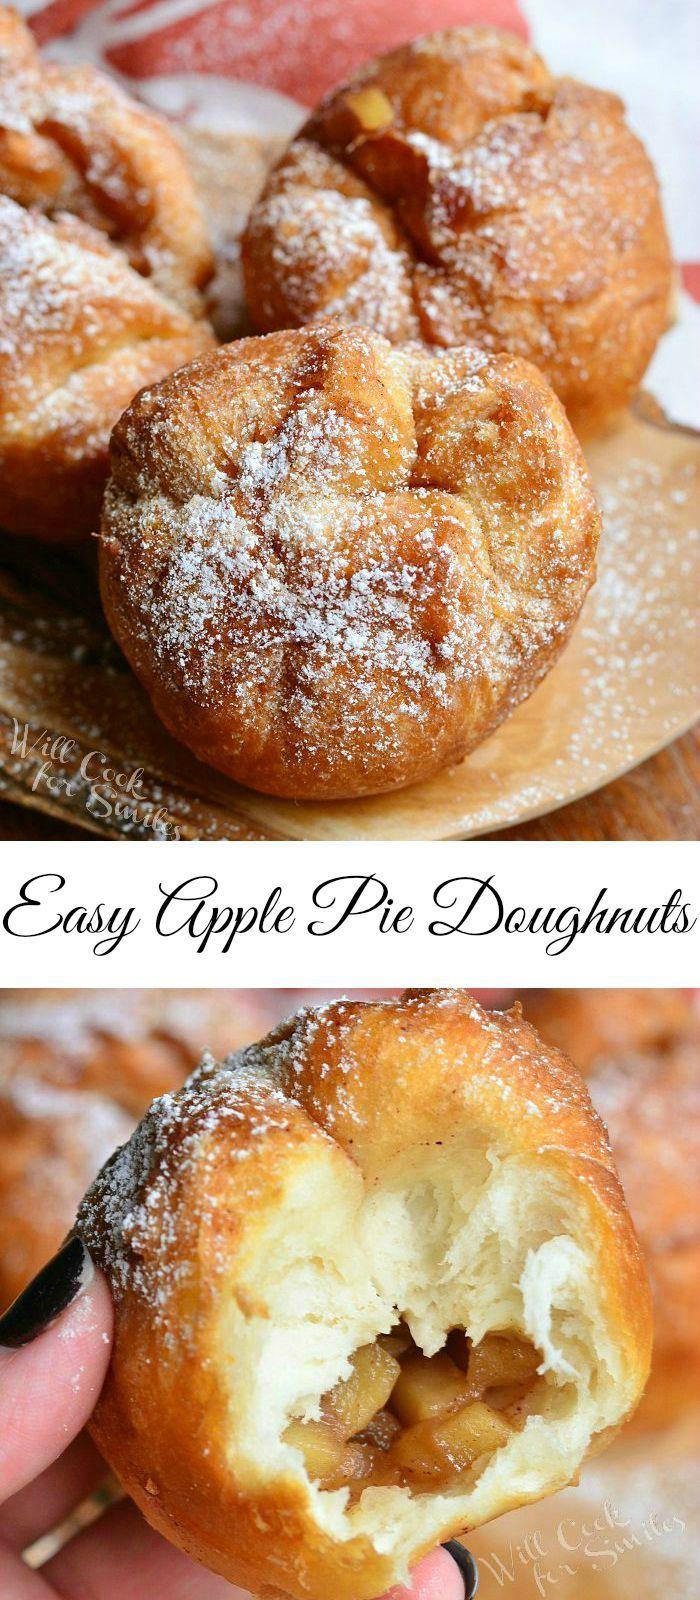 Easy Apple Pie Doughnuts | from willcookforsmiles... #breakfast #dessert #apple